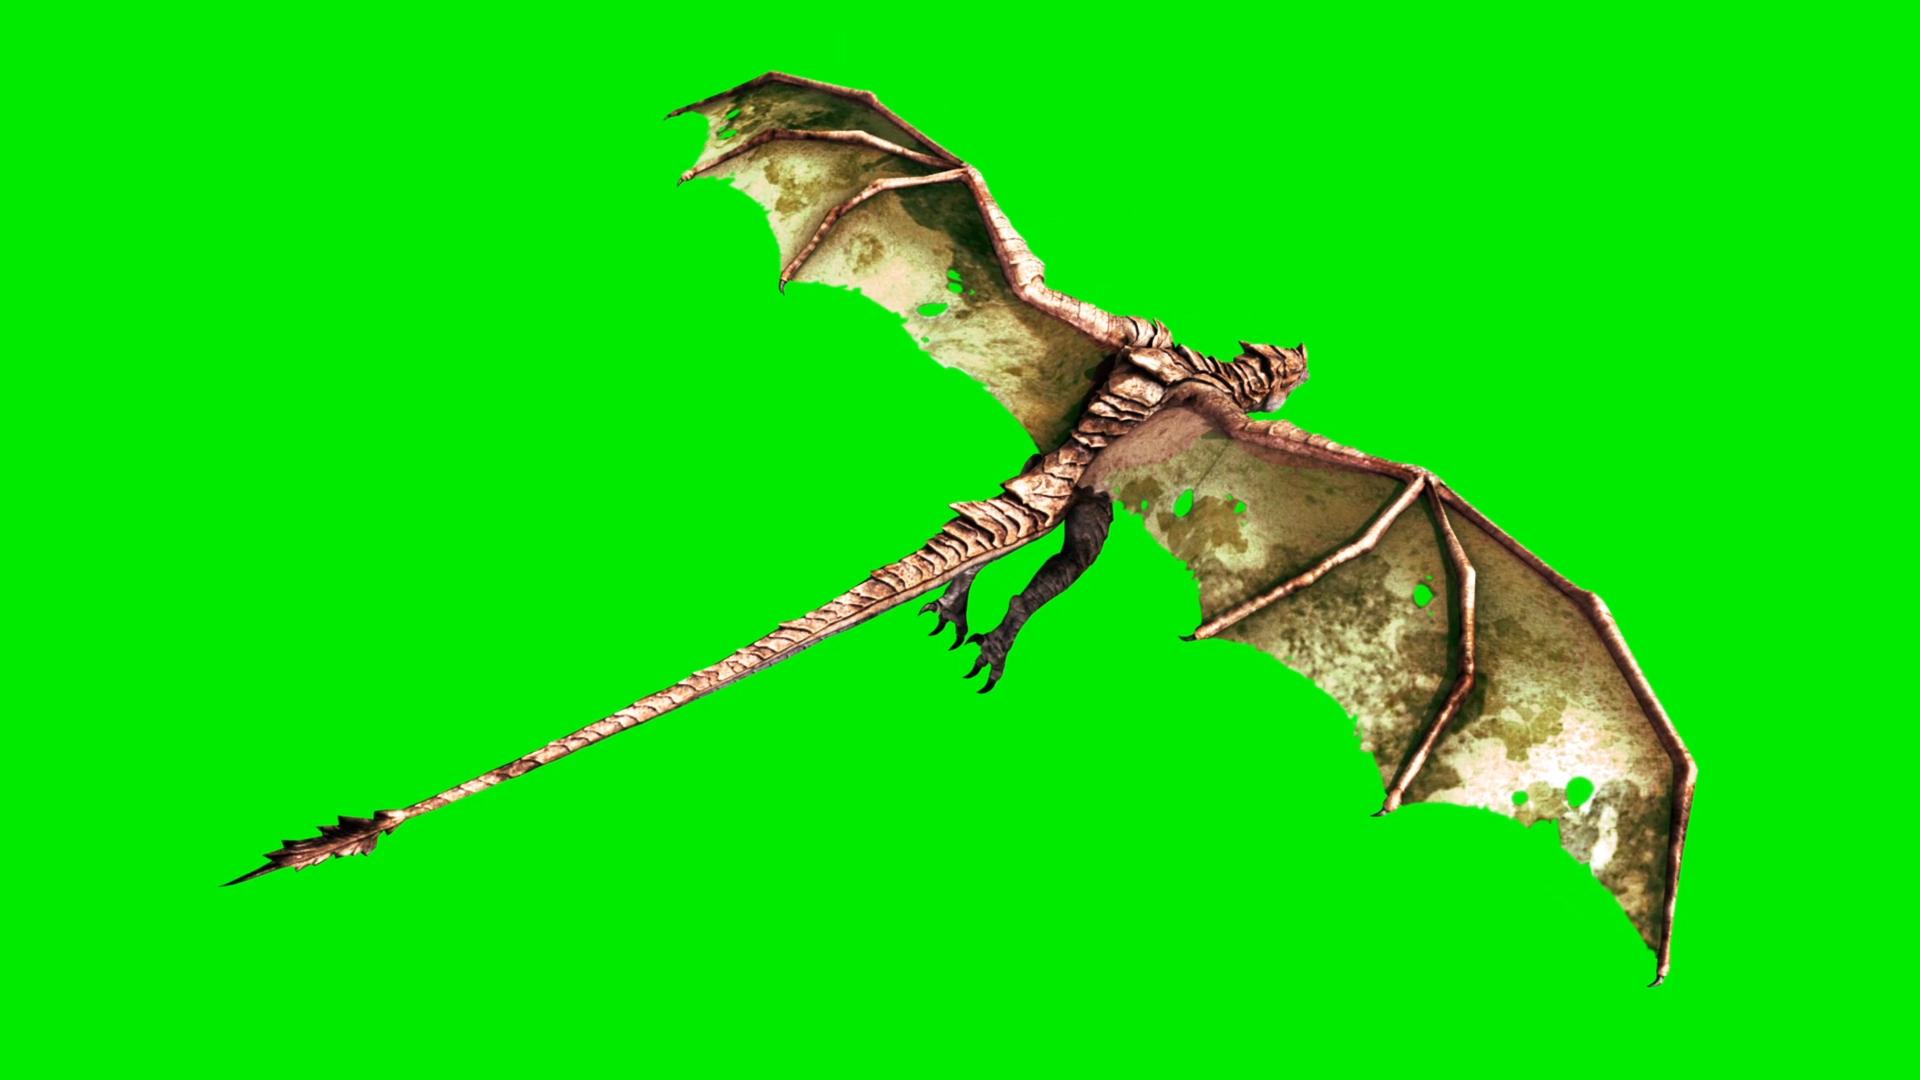 big dragon fly pixelboom